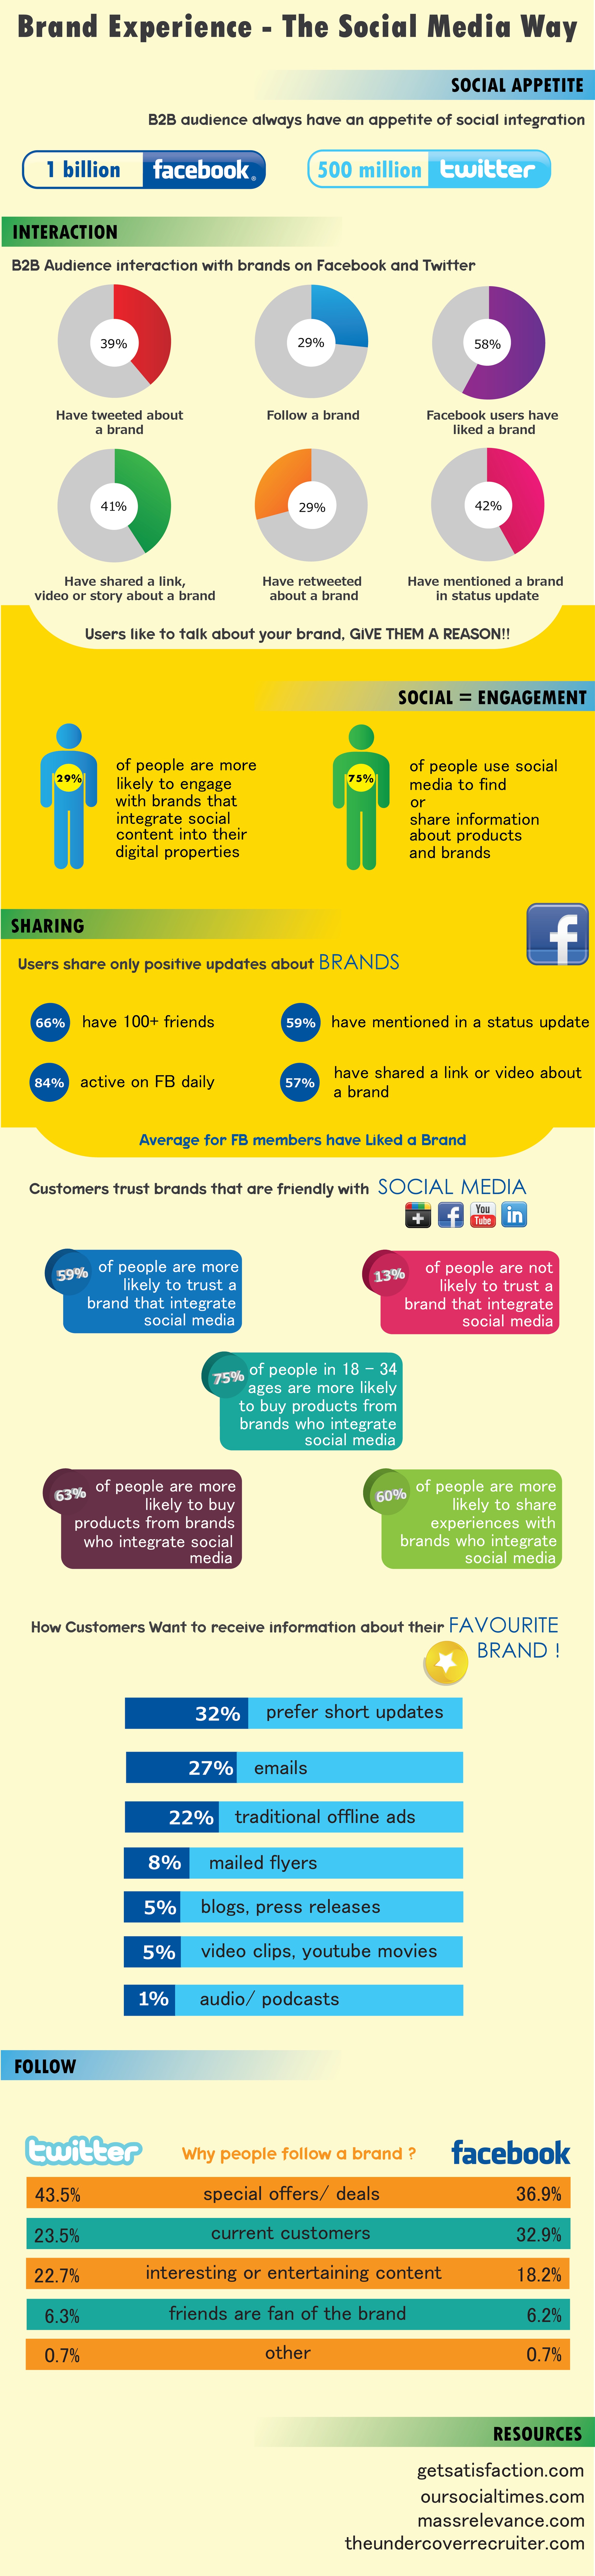 Brand Experience The Social Media Way